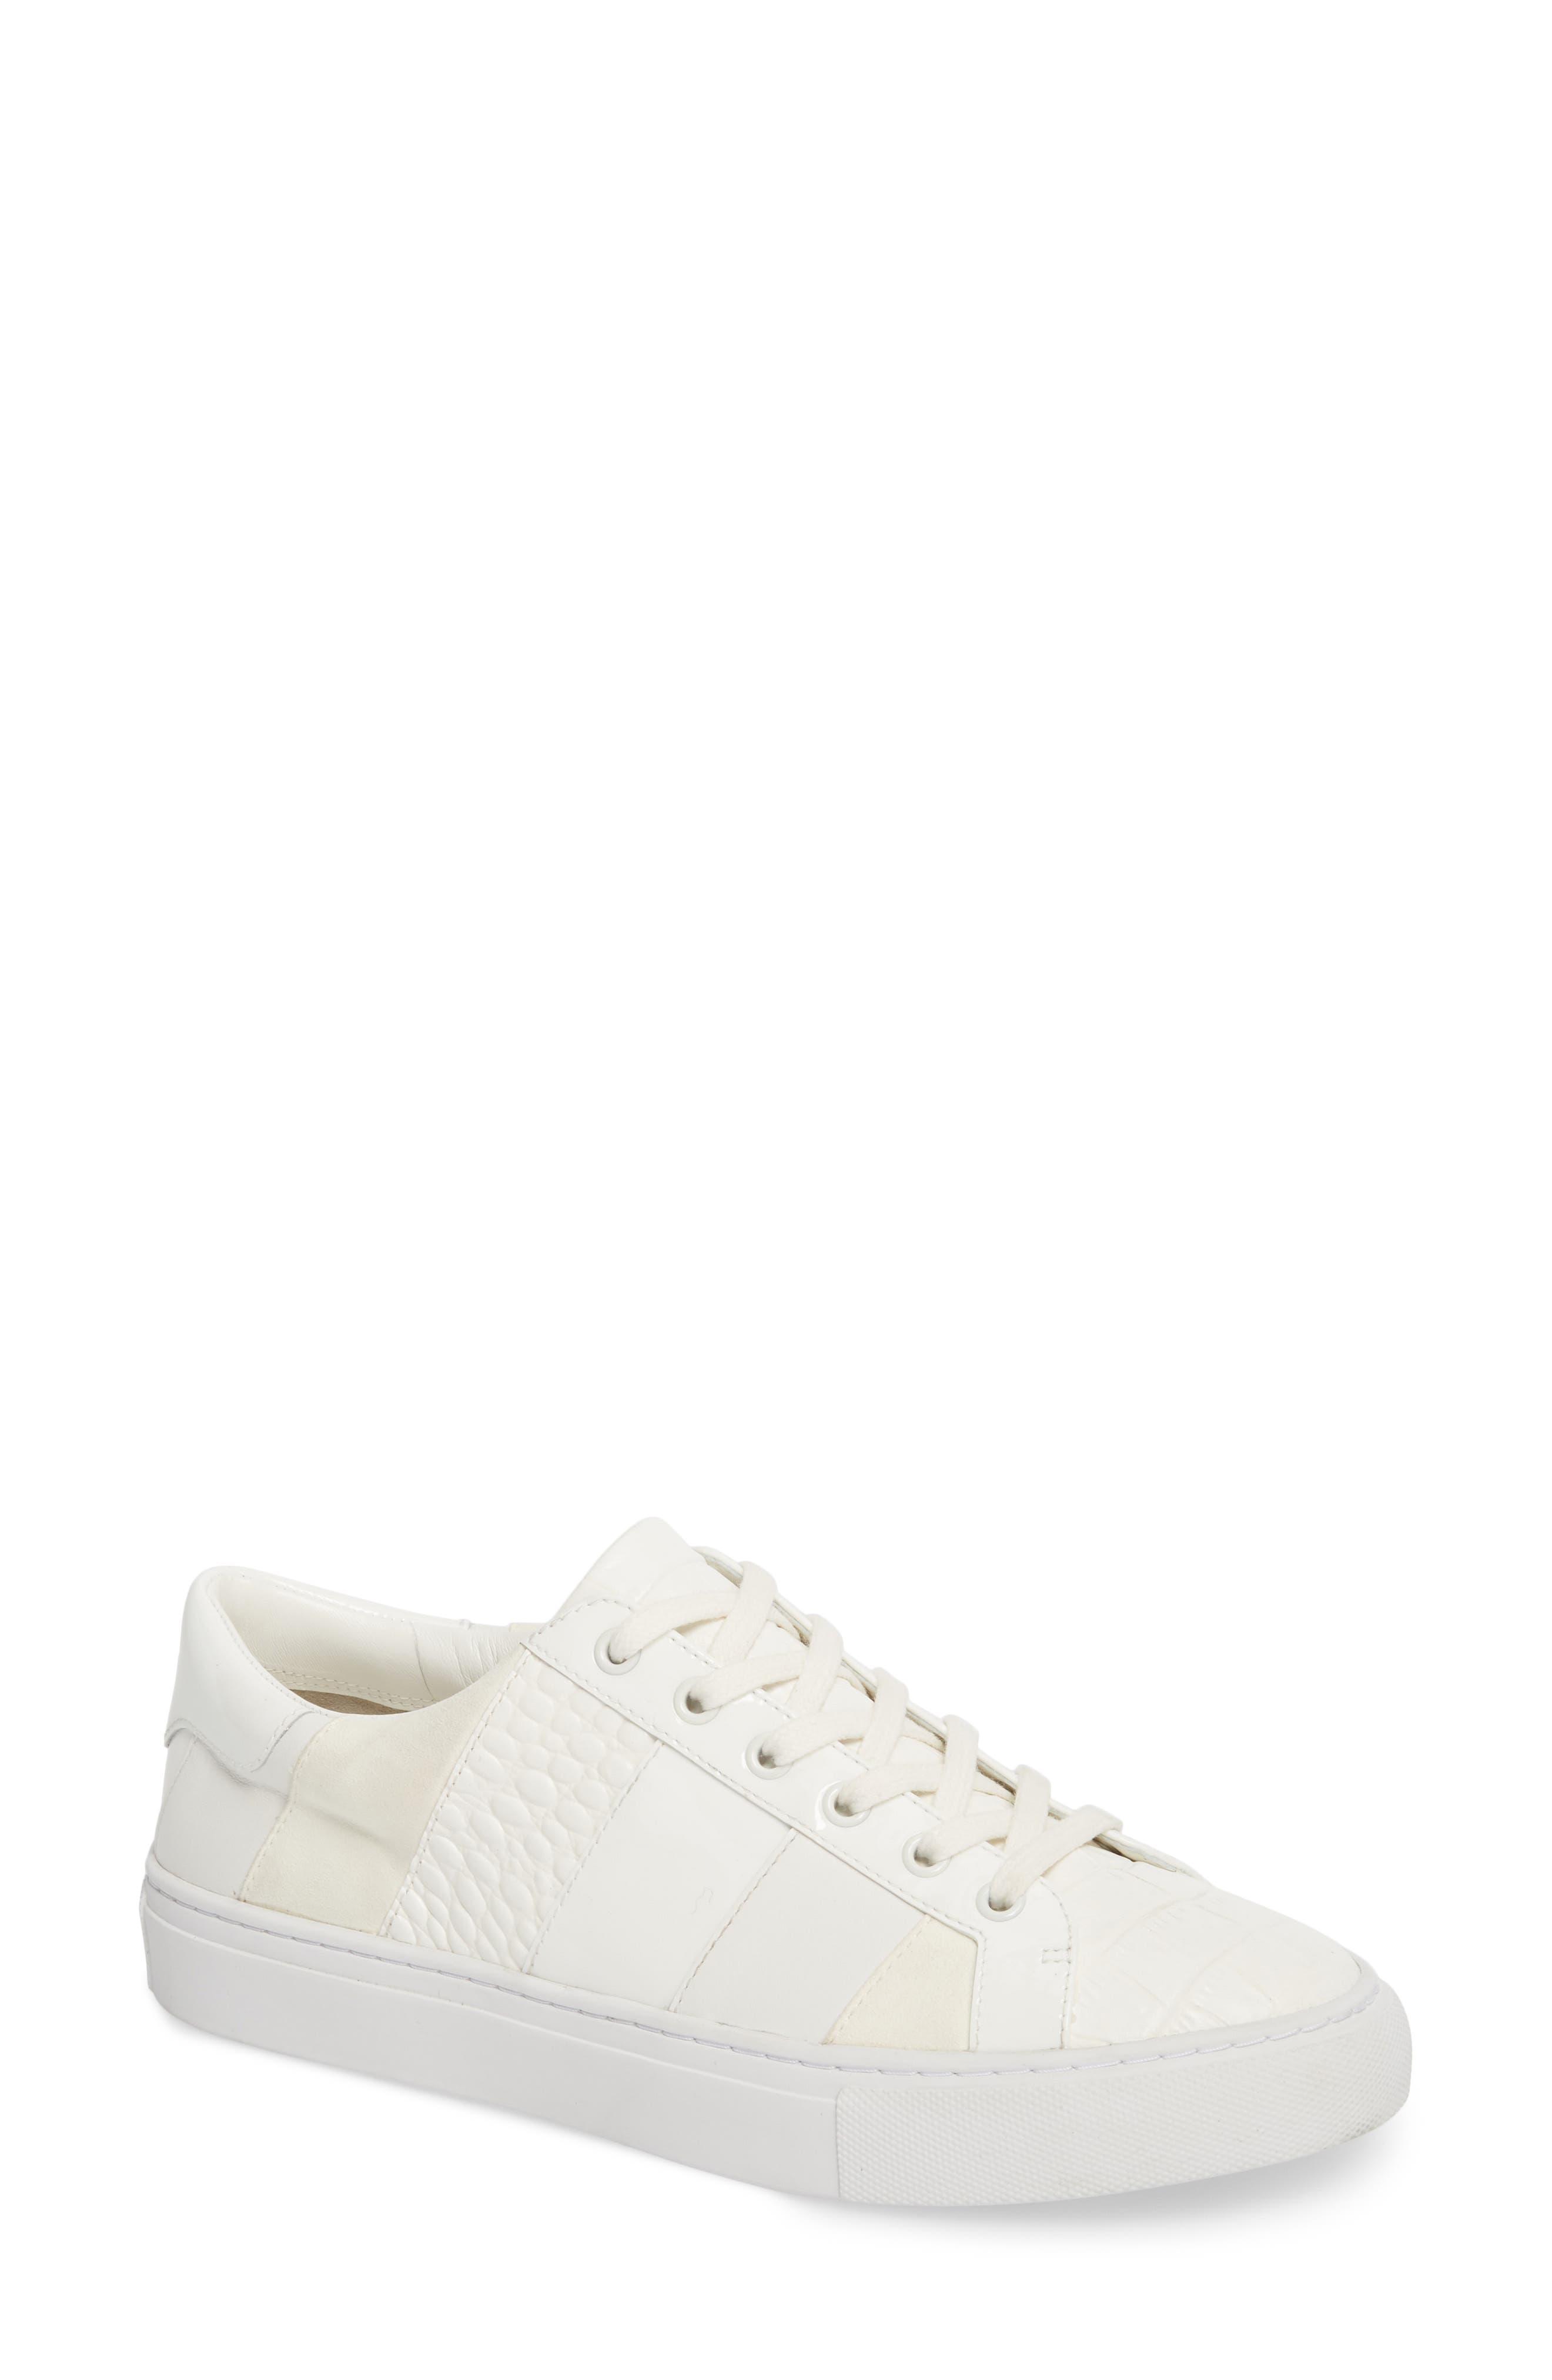 Ames Sneaker,                         Main,                         color, SNOW WHITE